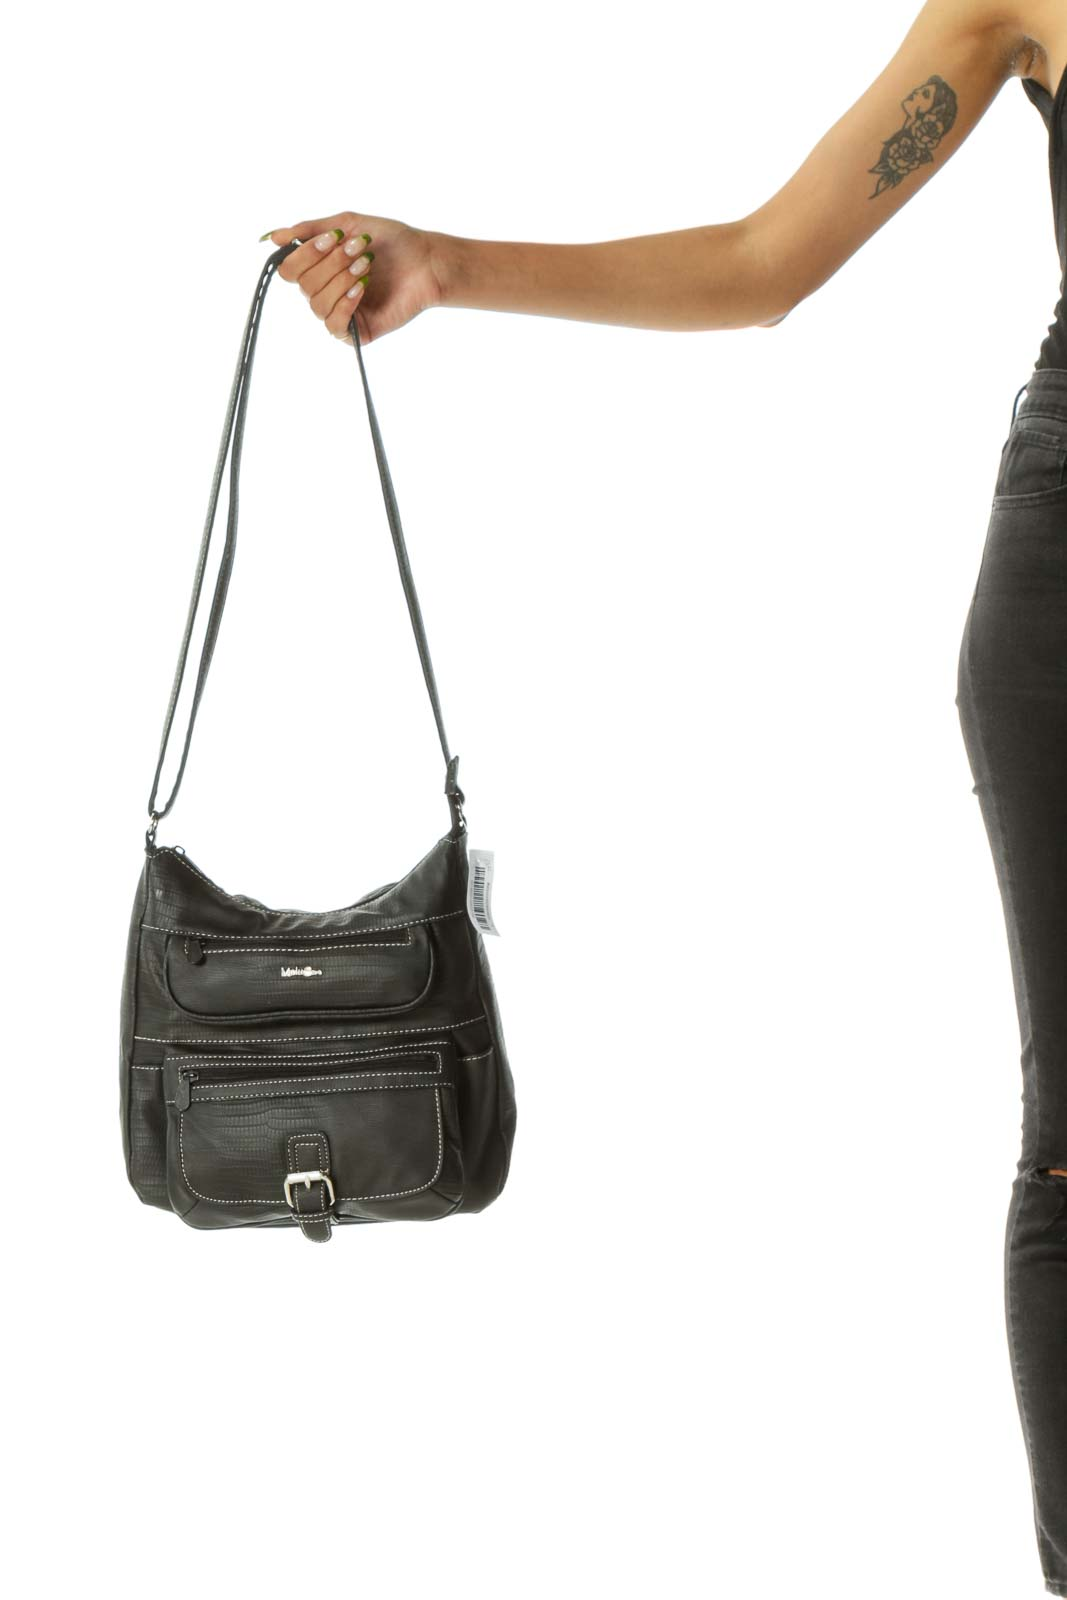 Black Cream Stitched Faux Alligator Skin Pocketed Crossbody Bag